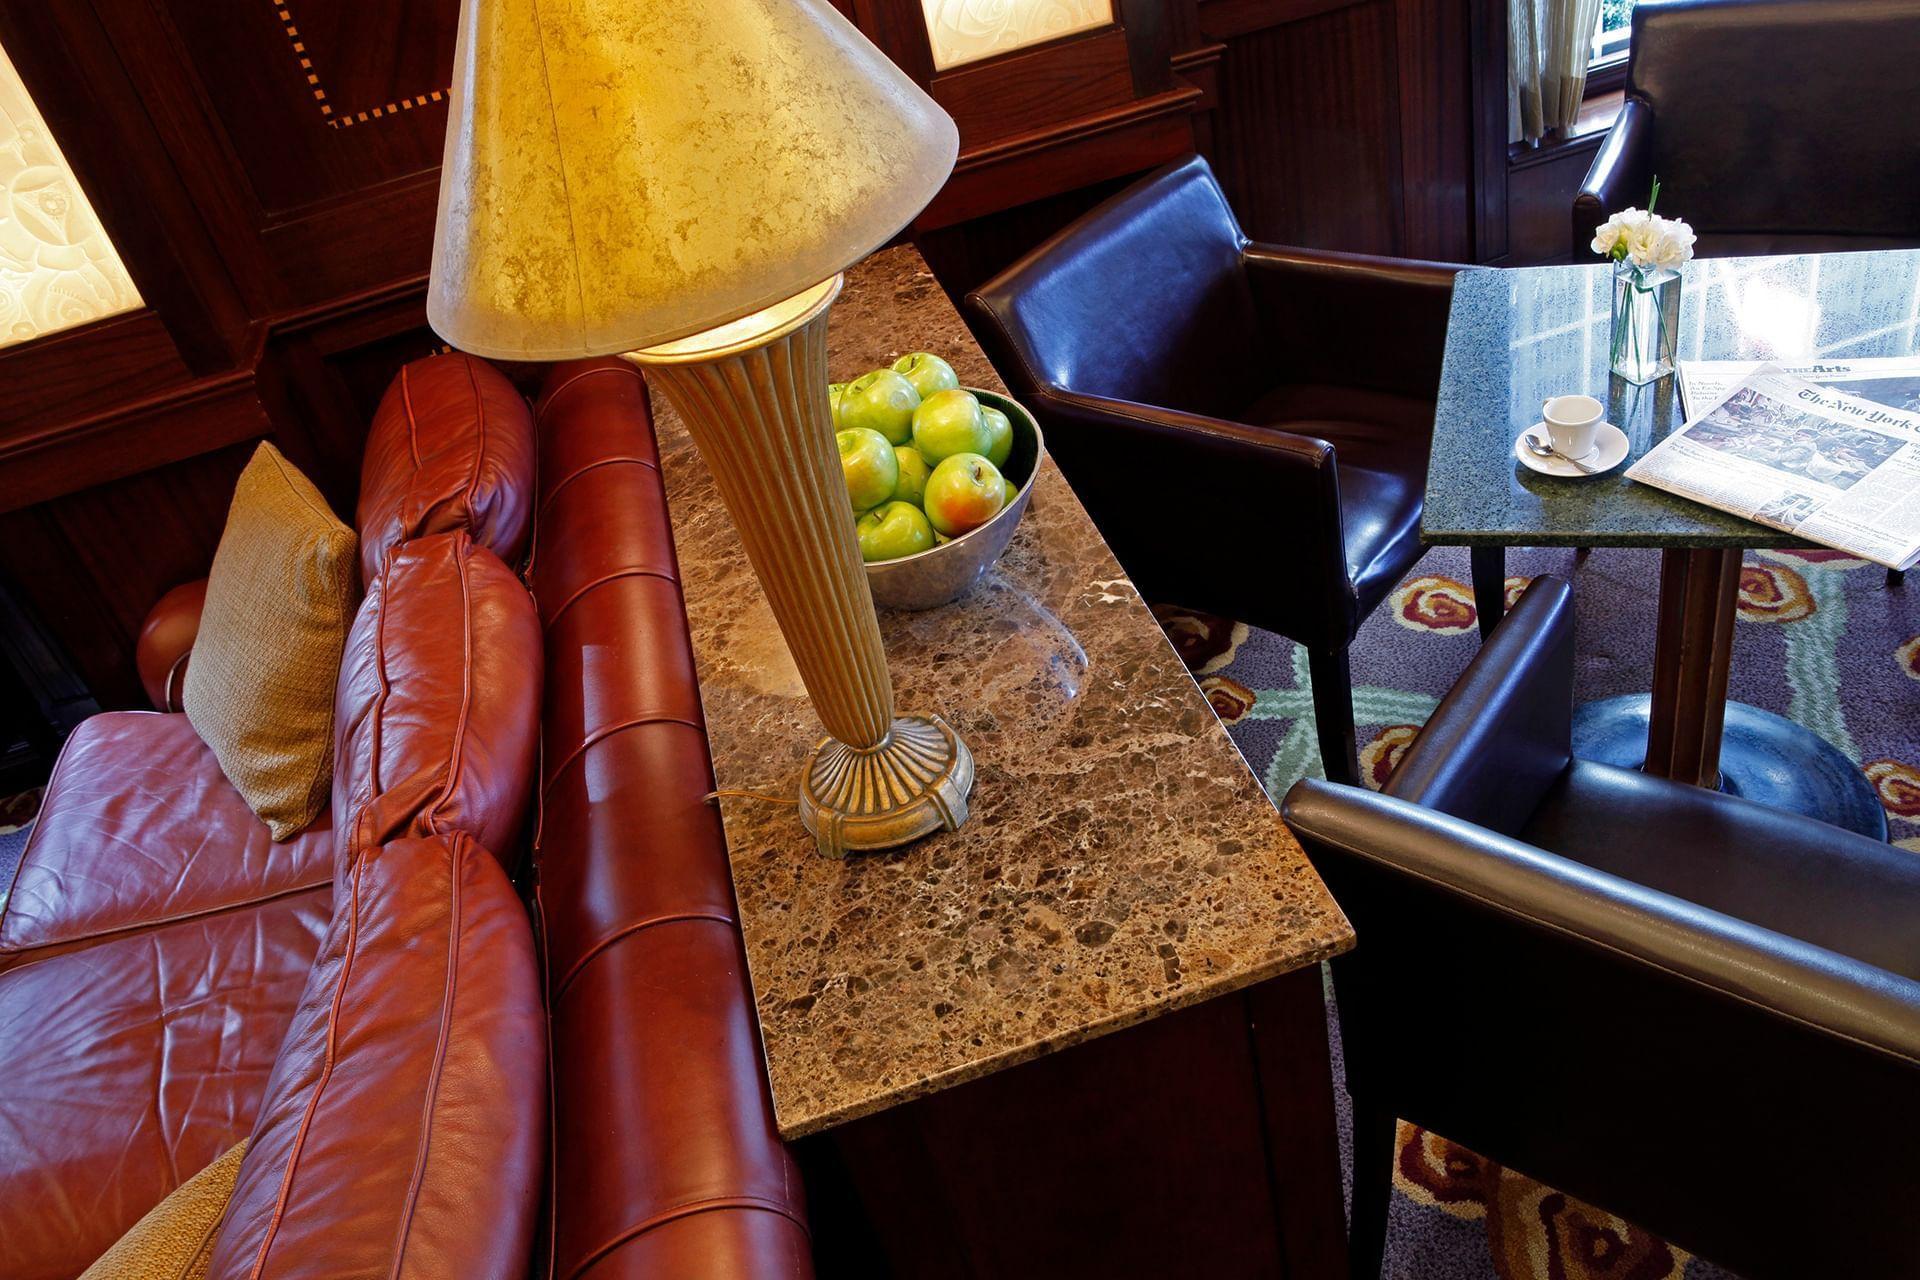 Randolph's Sofa and Table